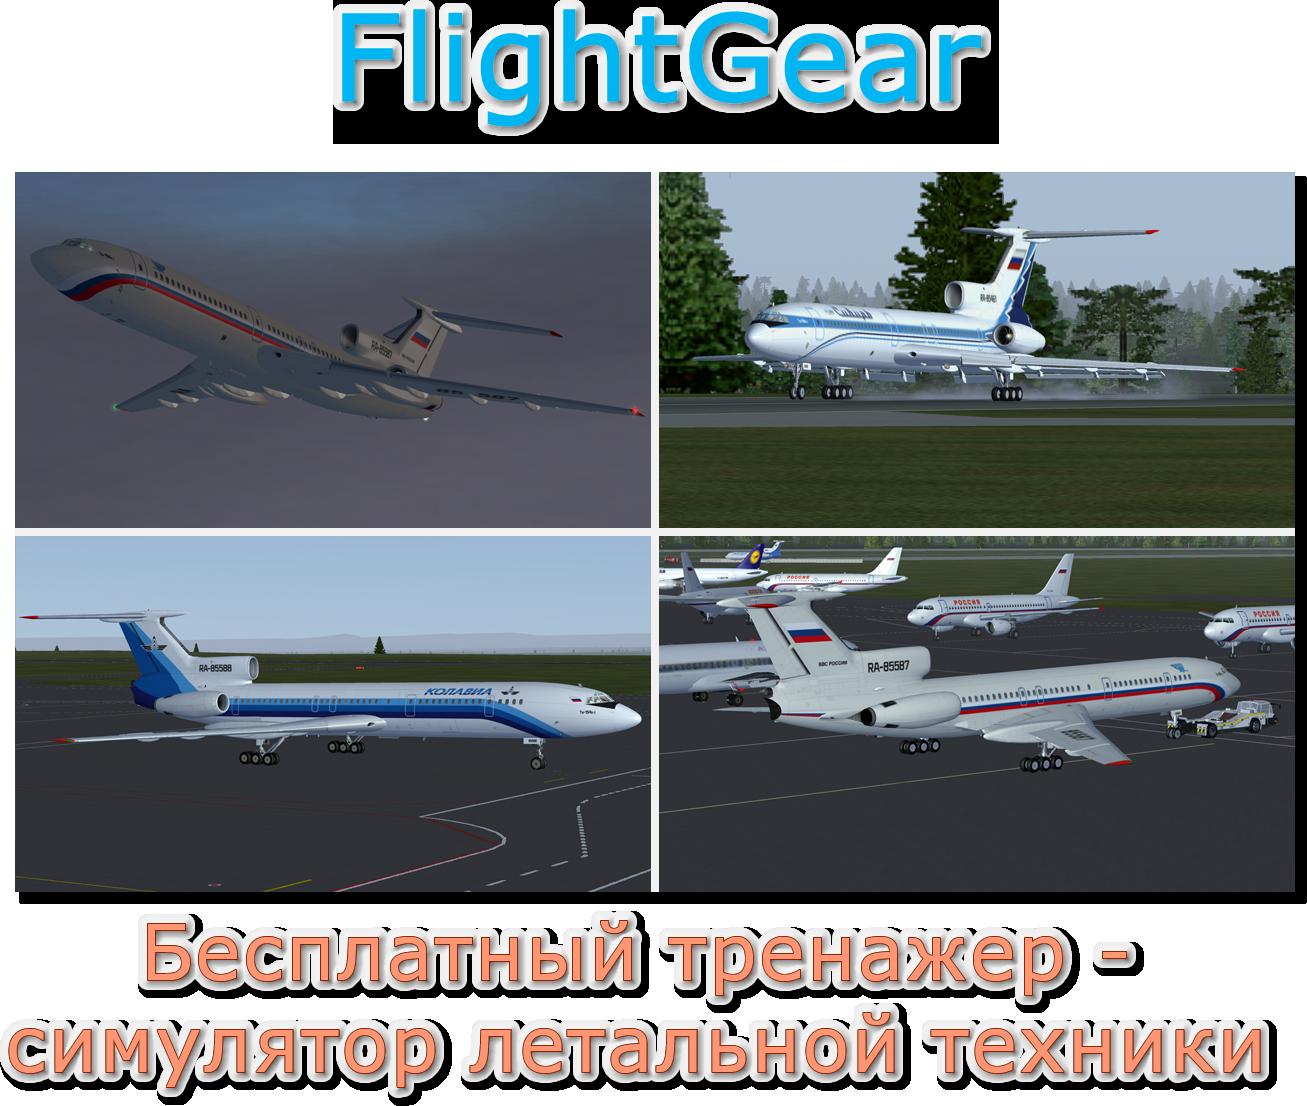 Симулятор Полета На Параплане Играть Онлайн